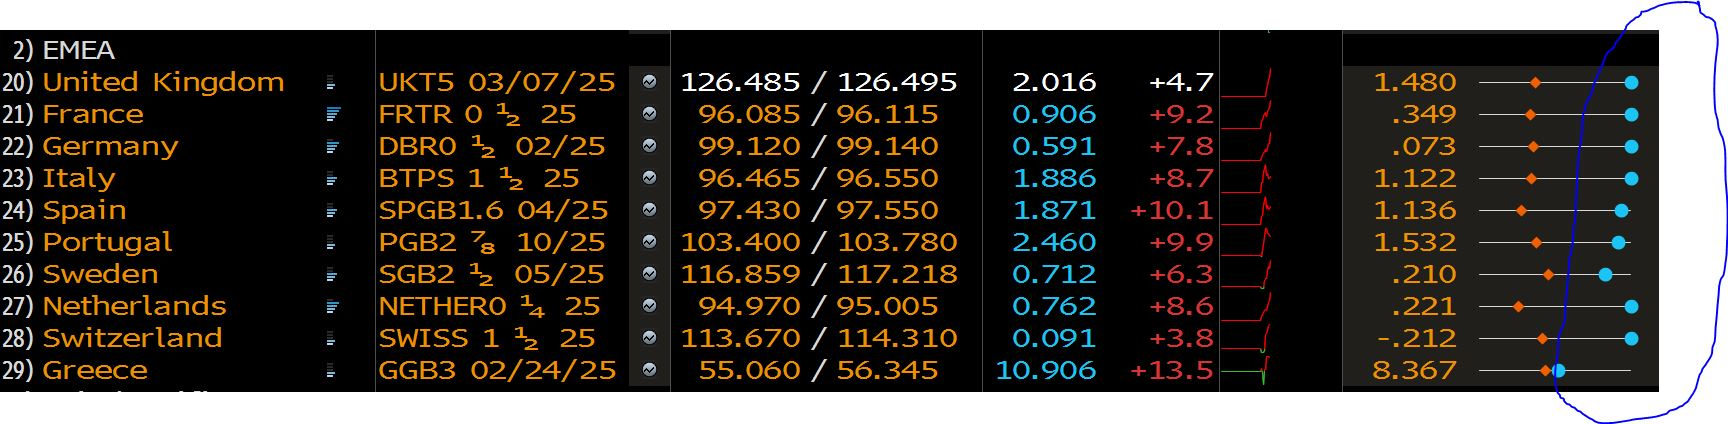 yields europe